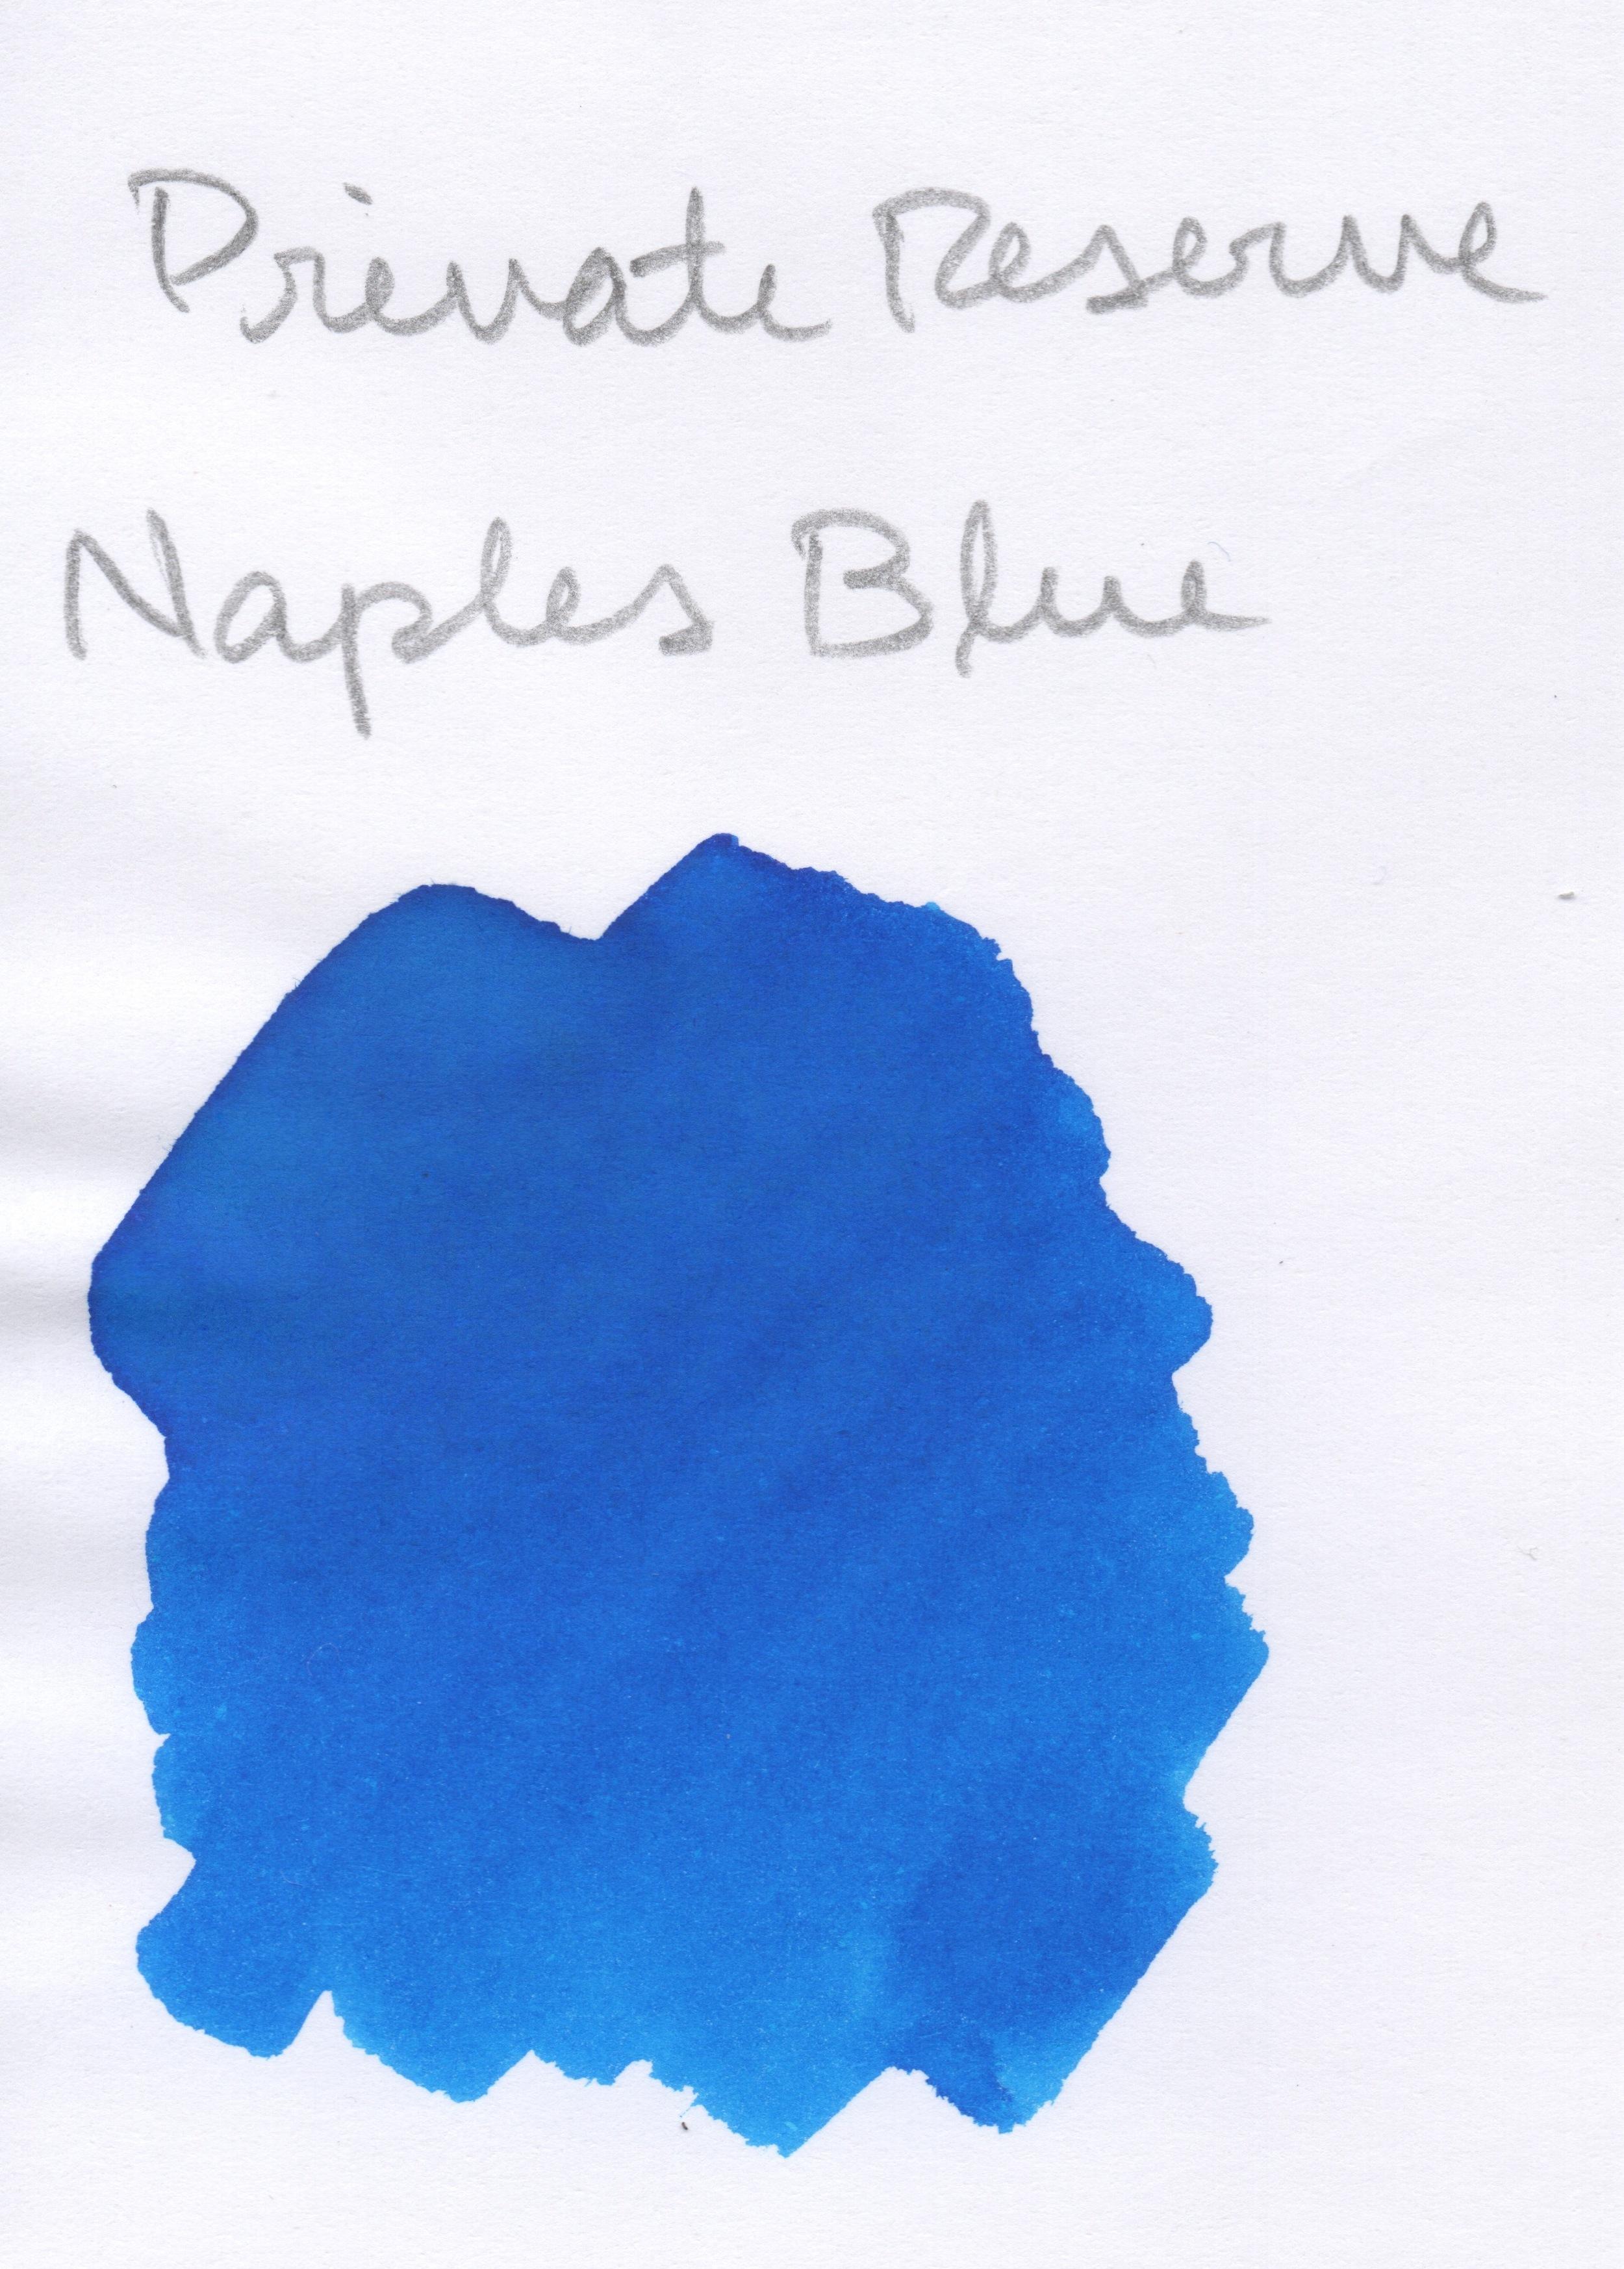 PR Naples Blue.jpeg